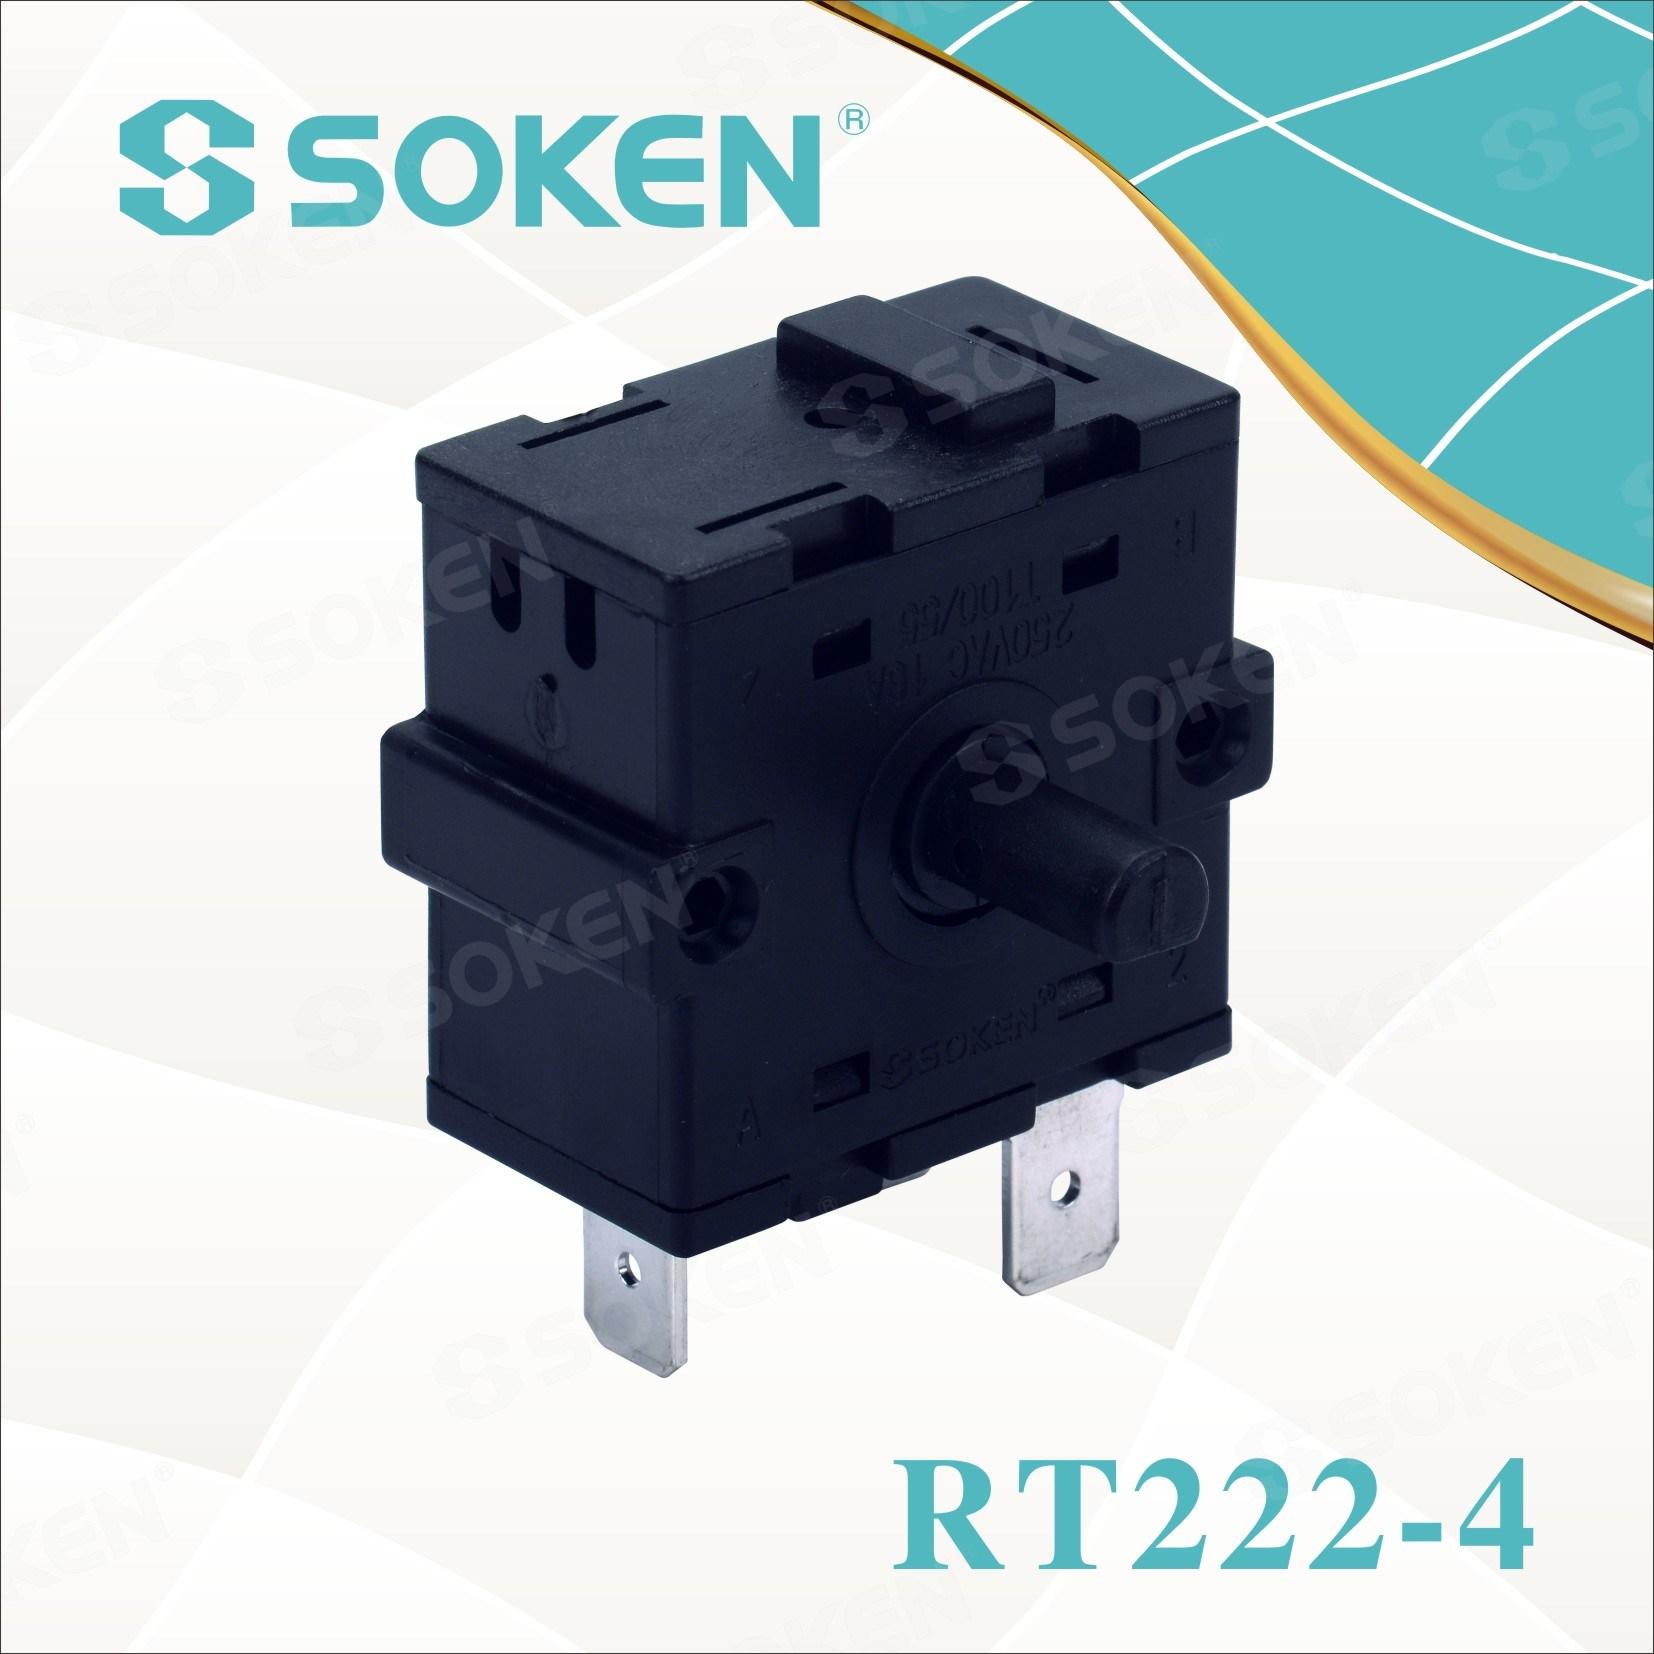 Soken 3 Positsioon Rotary Switch